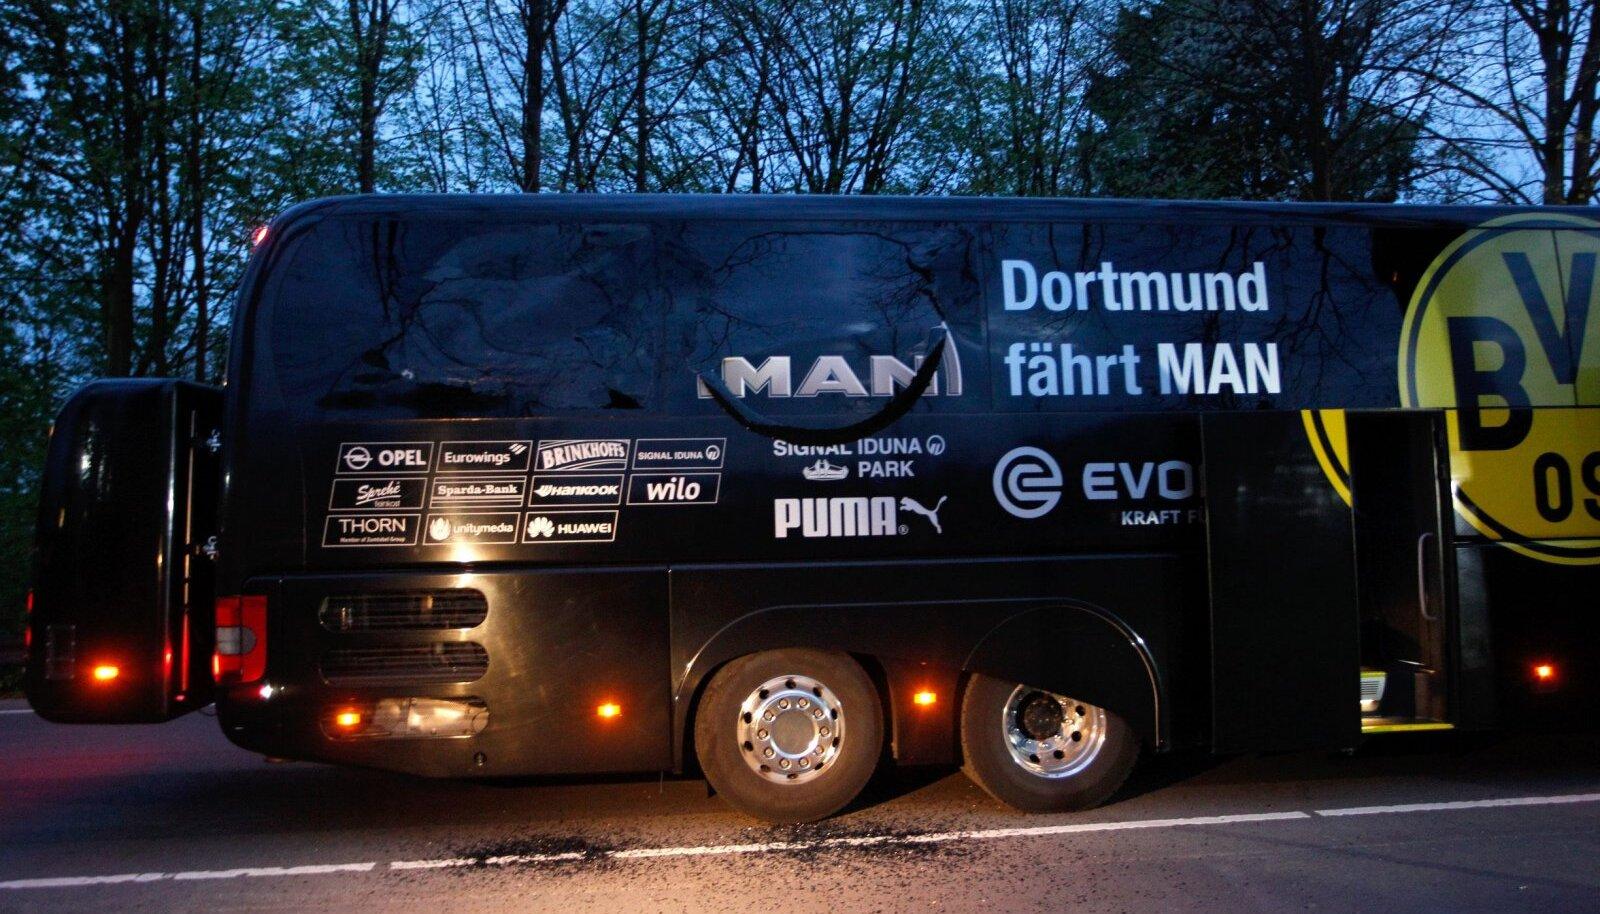 Dortmundi Borussia buss pärast pommirünnakut.